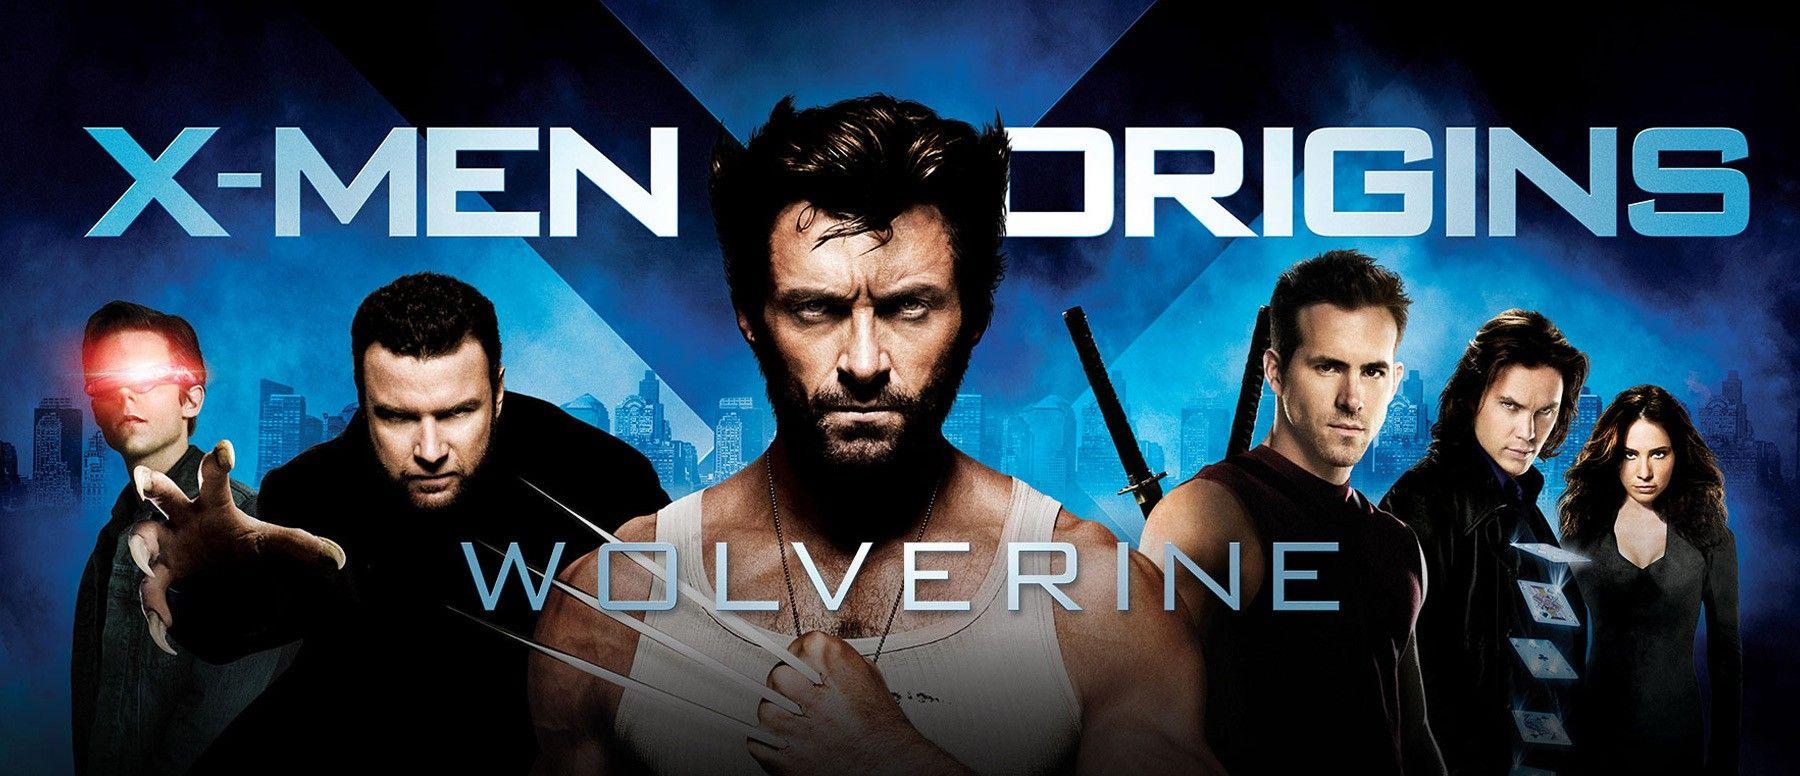 تحميل لعبة X Men Origins Wolverine لعبة ولفرين الراجل الذئب برابط مباشر Wolverine Movie X Men Movie Blog